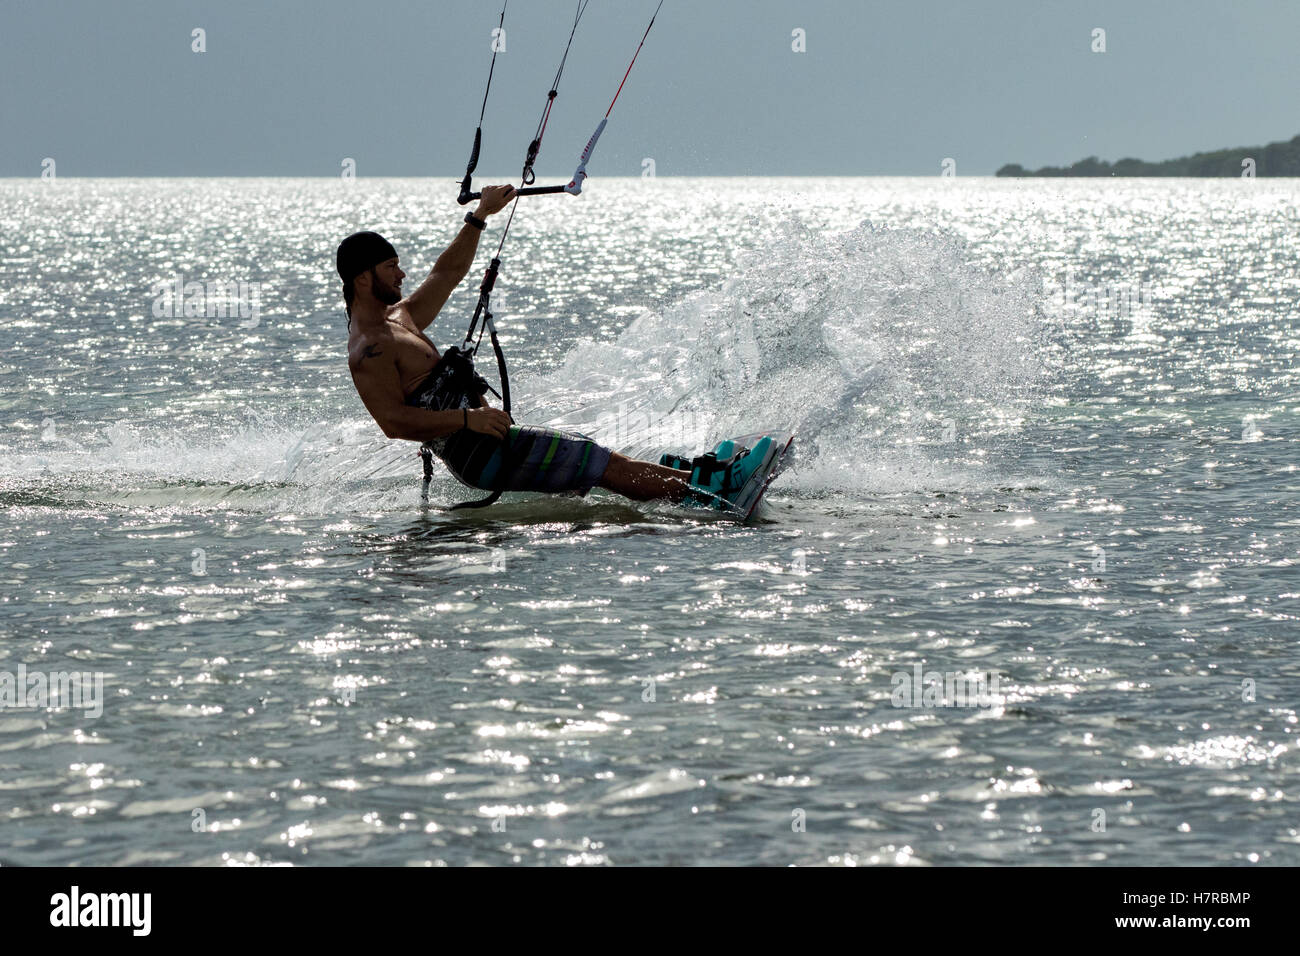 Professional Kitesurfer Bret Sullivan at Veterans Memorial Park - Little Duck Key, Florida, USA - Stock Image